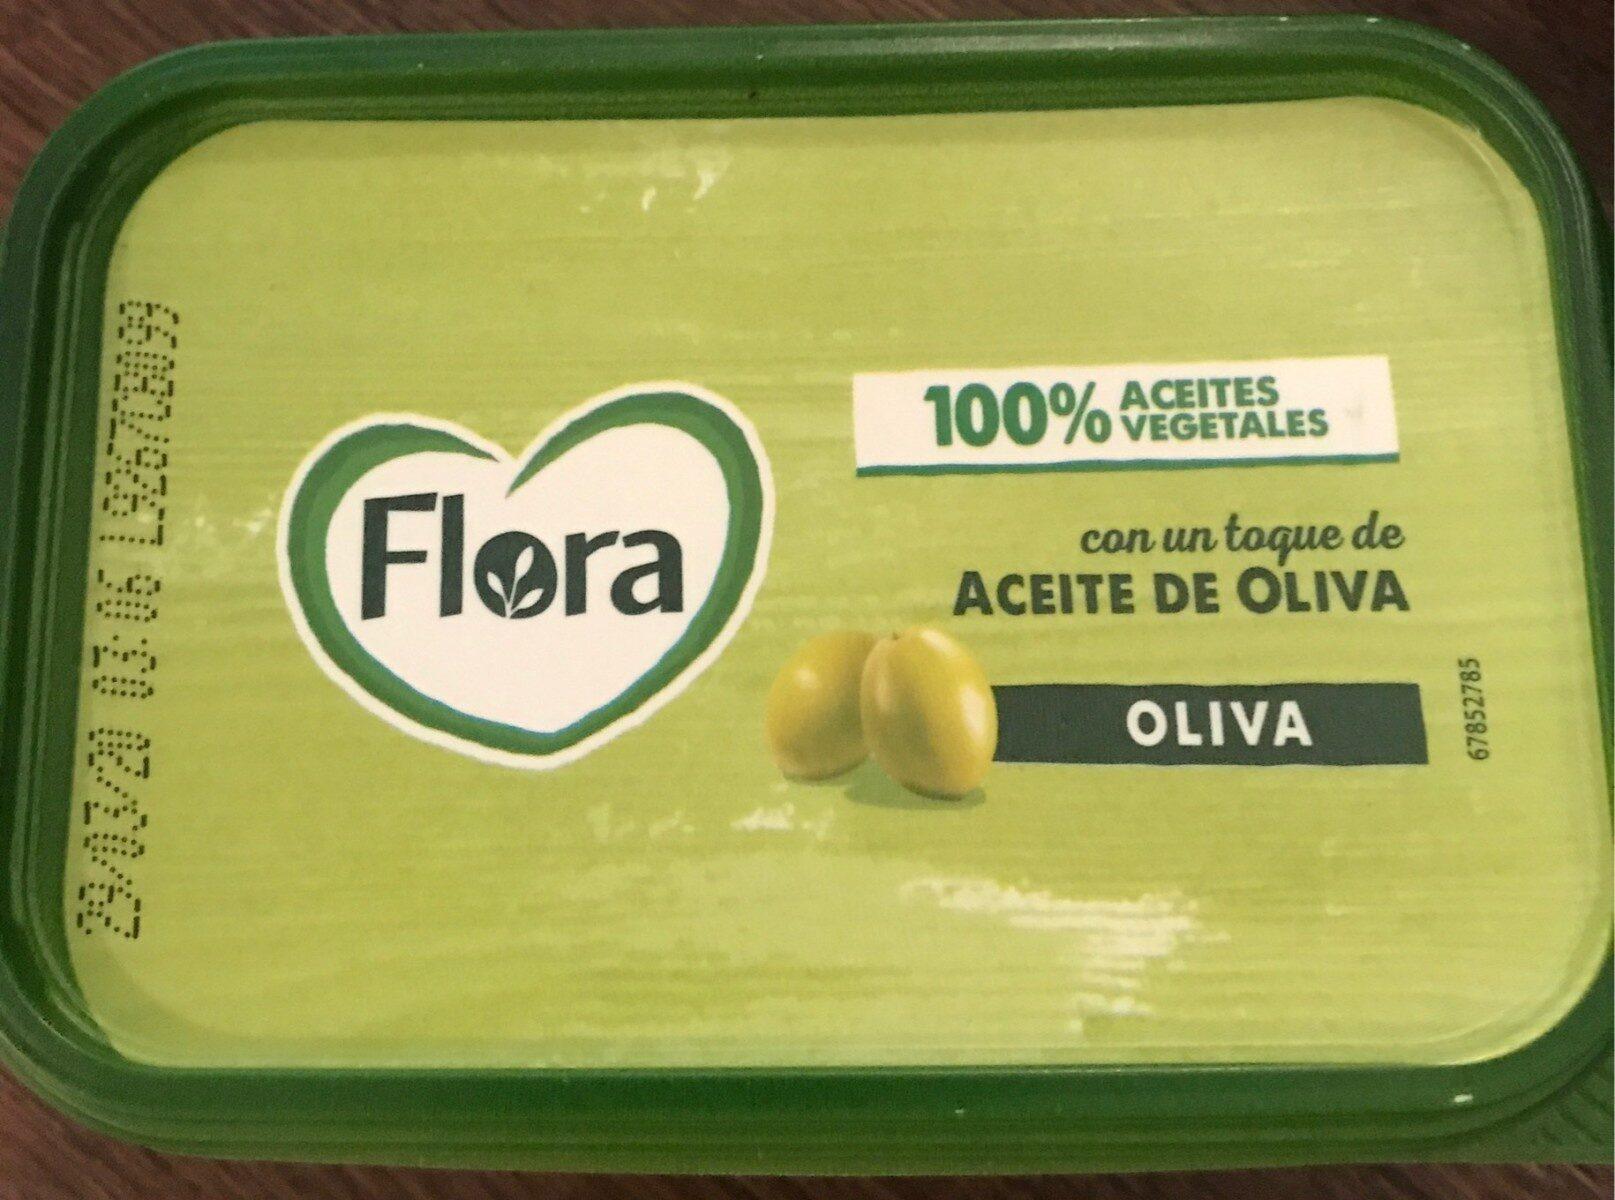 Margarina 100% vegetal con aceite de oliva - Producte - es